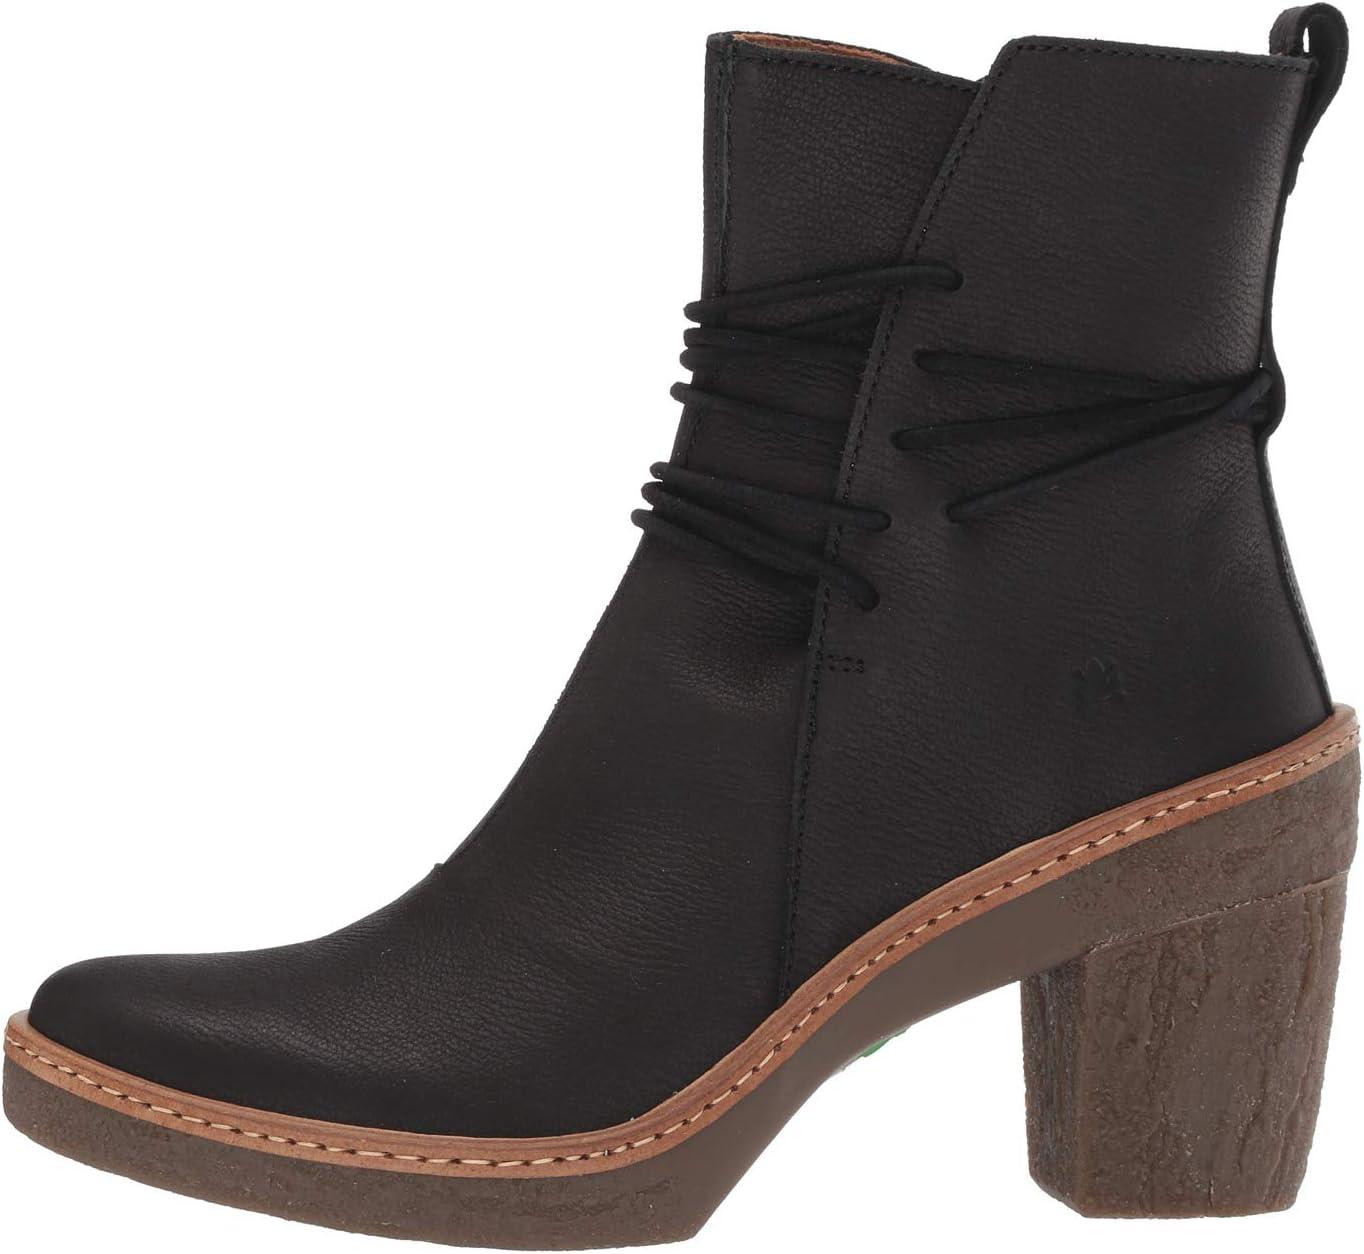 El Naturalista Haya N5175 | Women's shoes | 2020 Newest